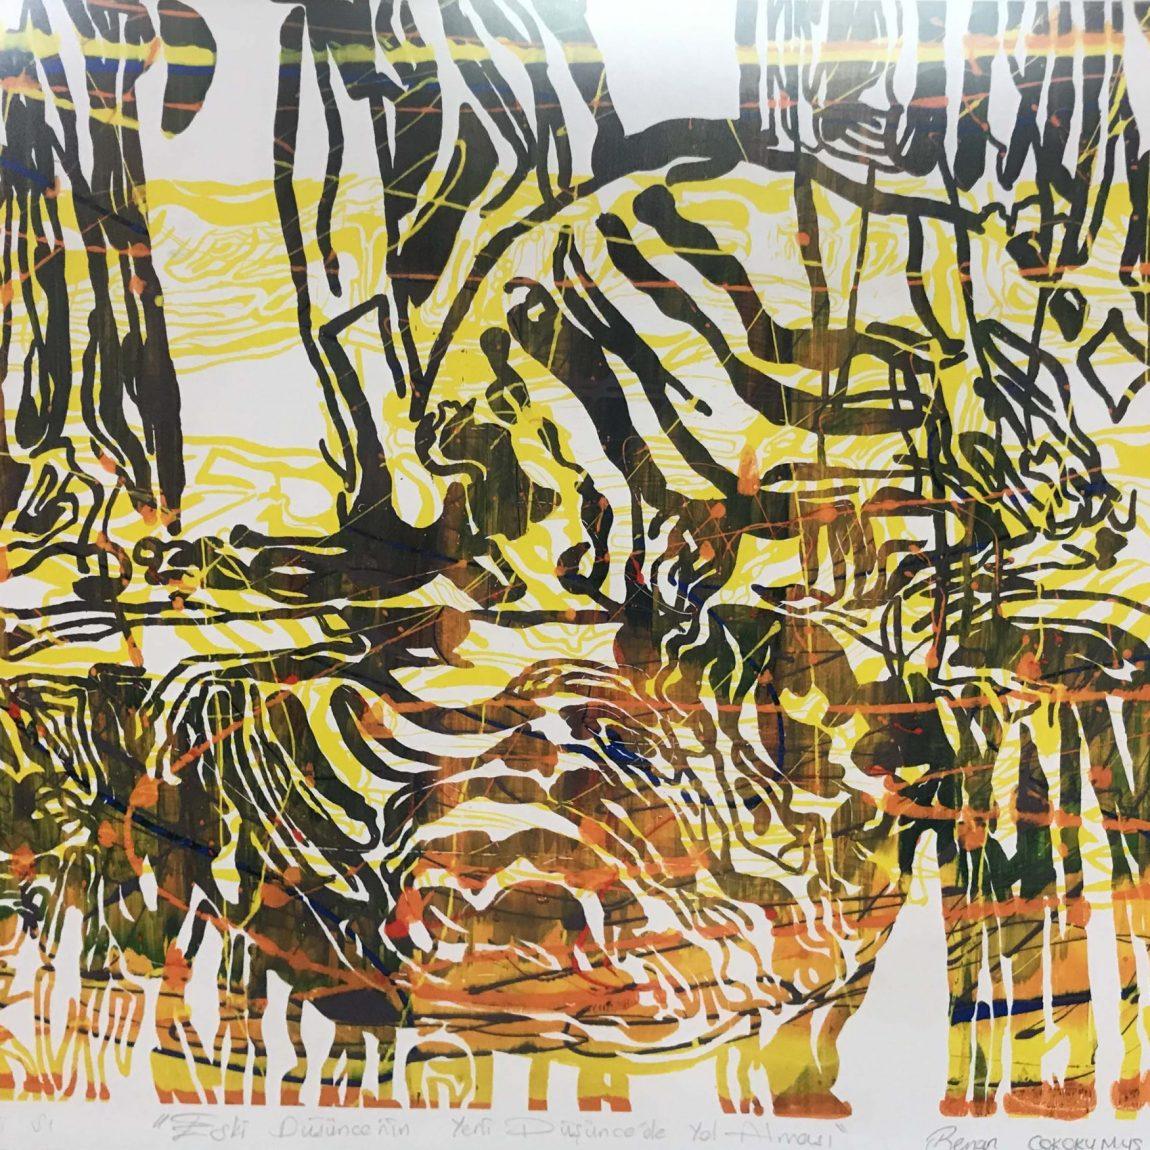 Sanatçı:Benan Çokokumuş  Teknik : Özgün Baskı Ölçü: 71 x 90 cm  Fiyat : 7.100 TL